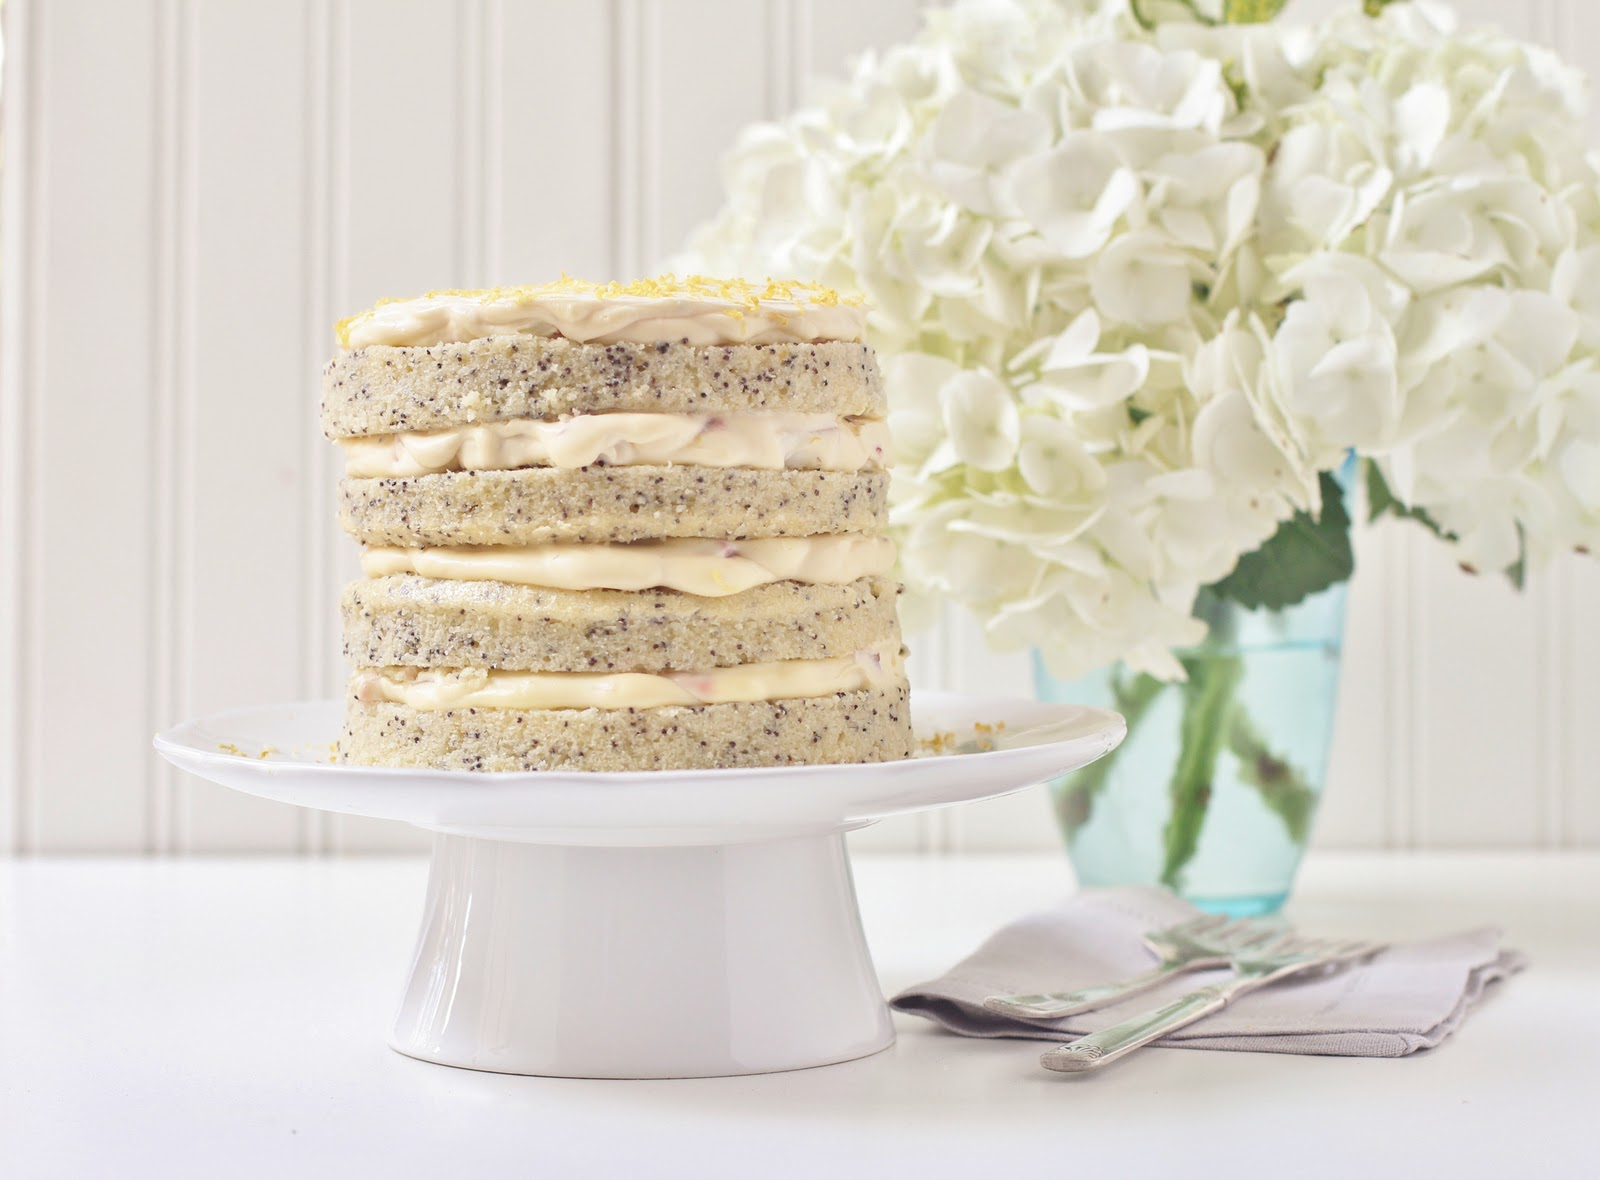 Beyond Sweet and Savory Lemon Poppy Seed Cake for My Birthday